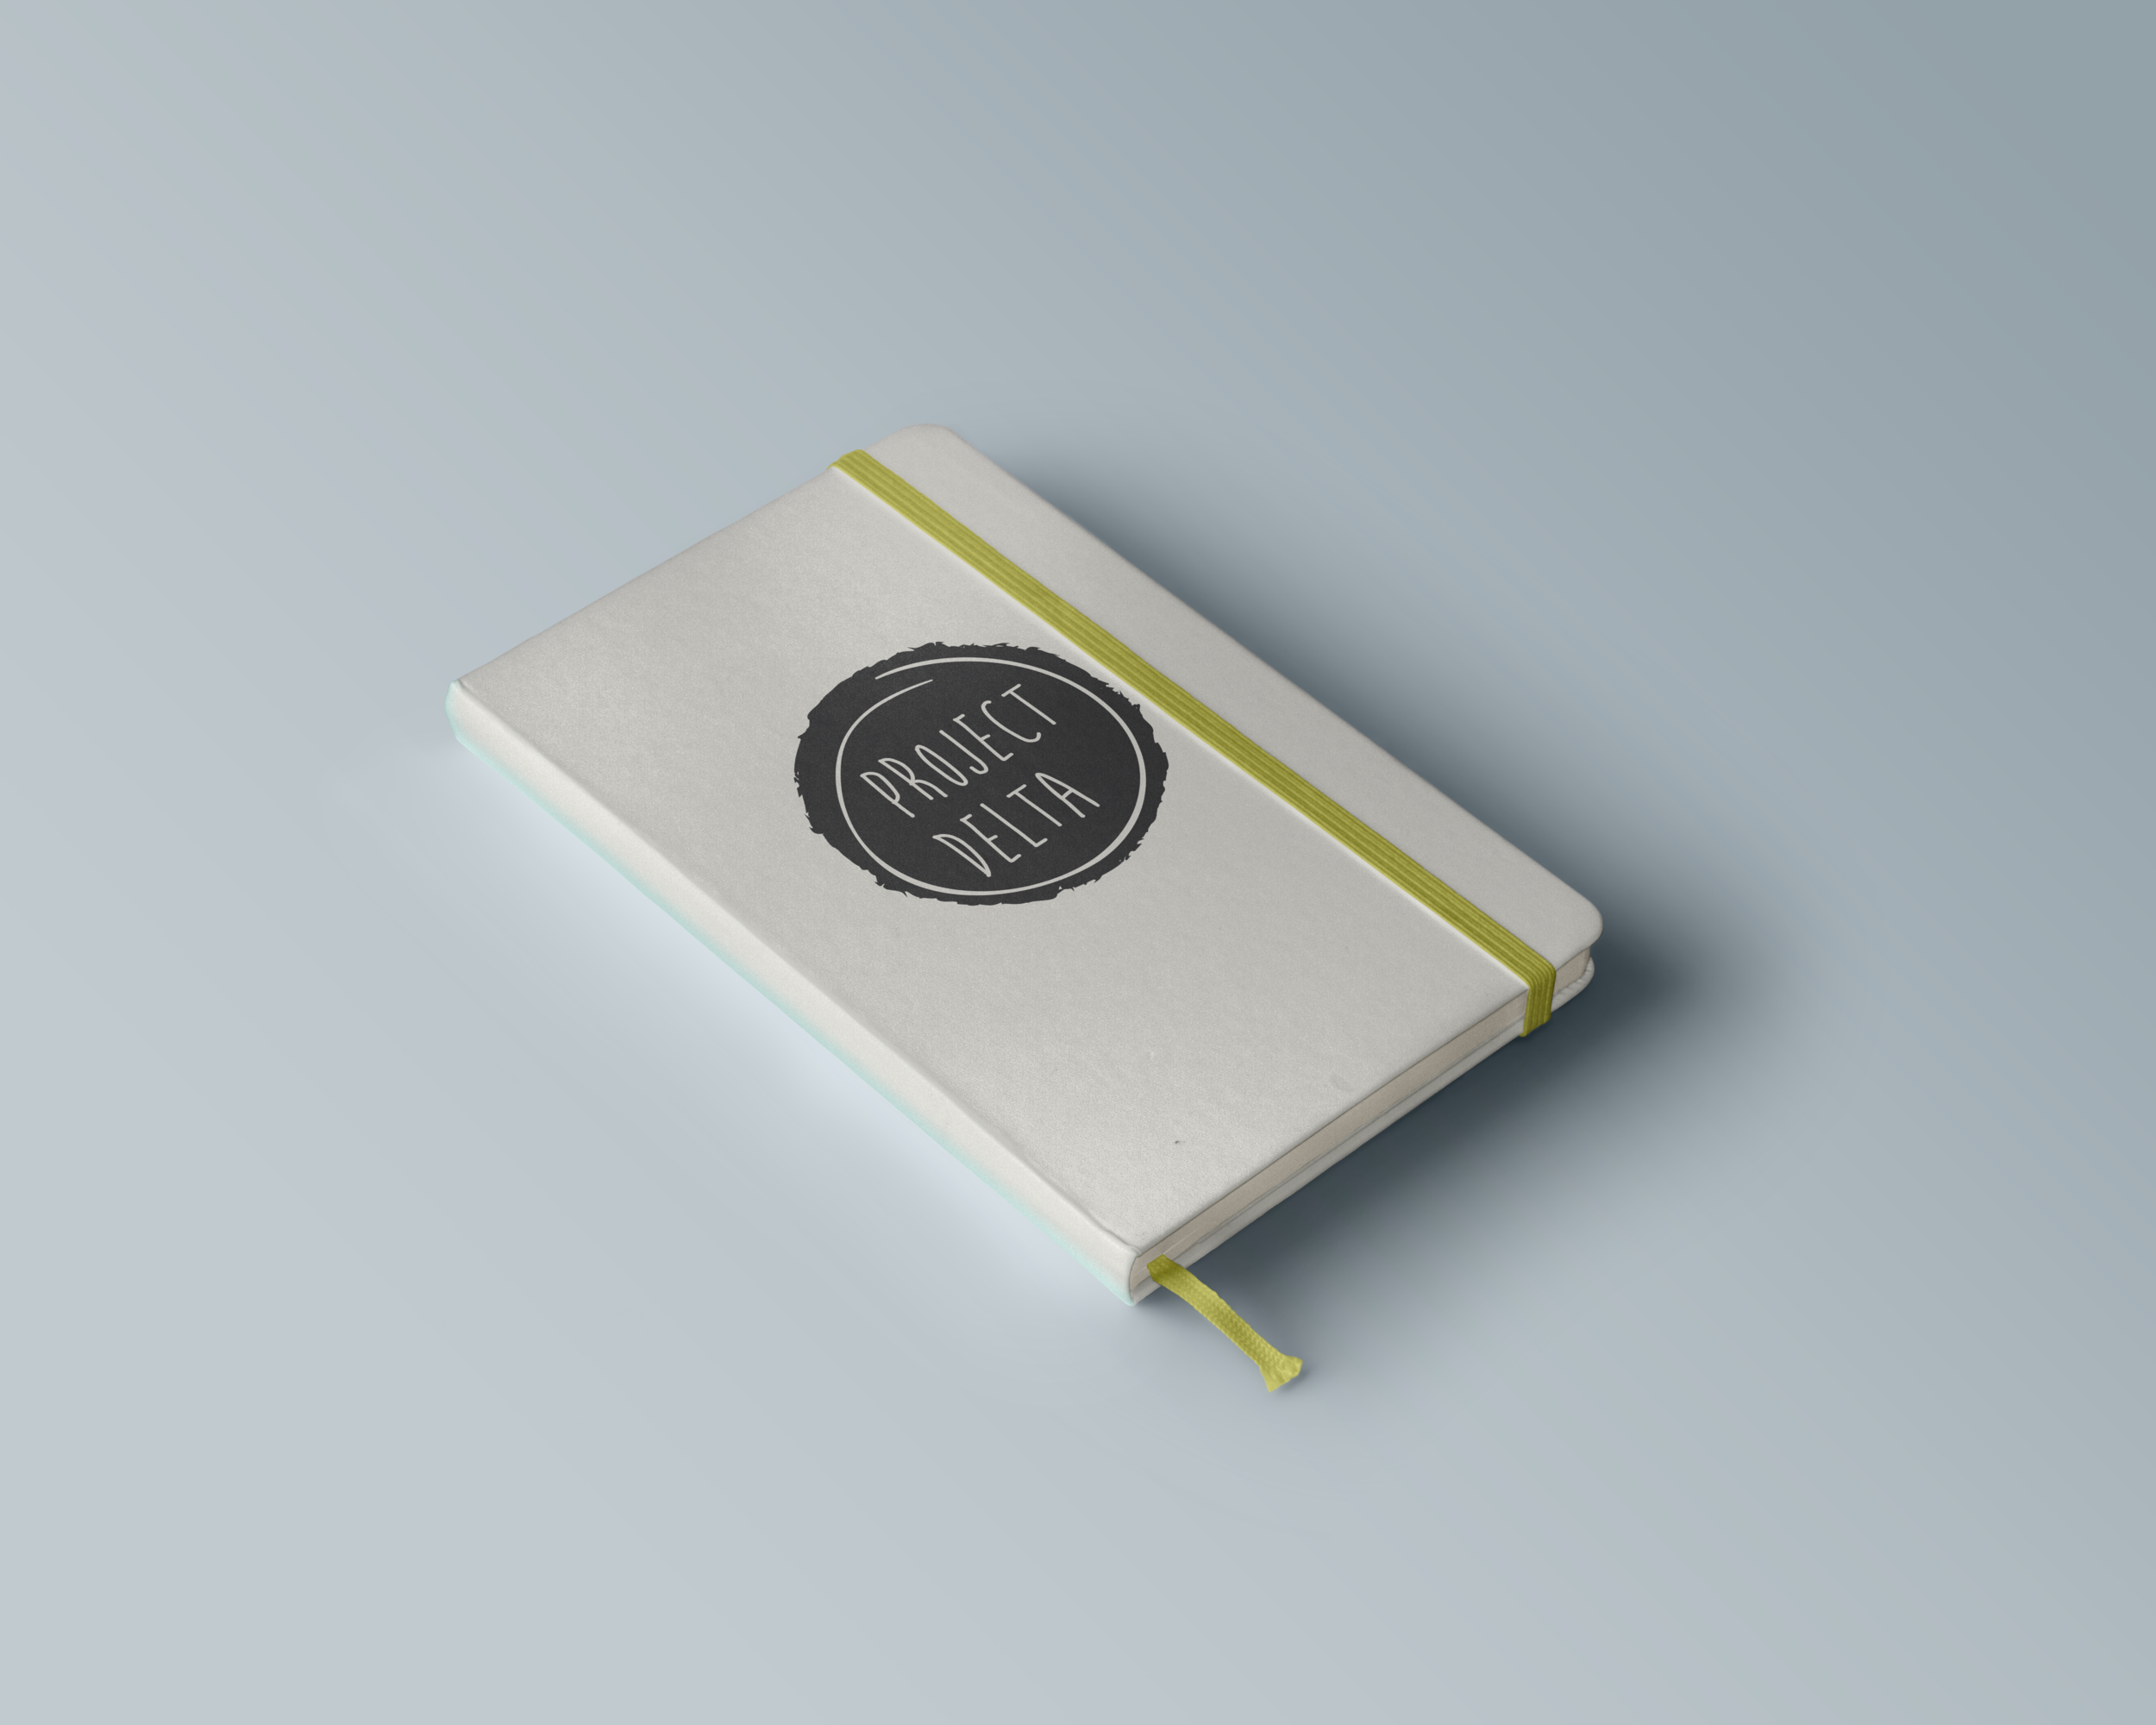 delta book white 2.png